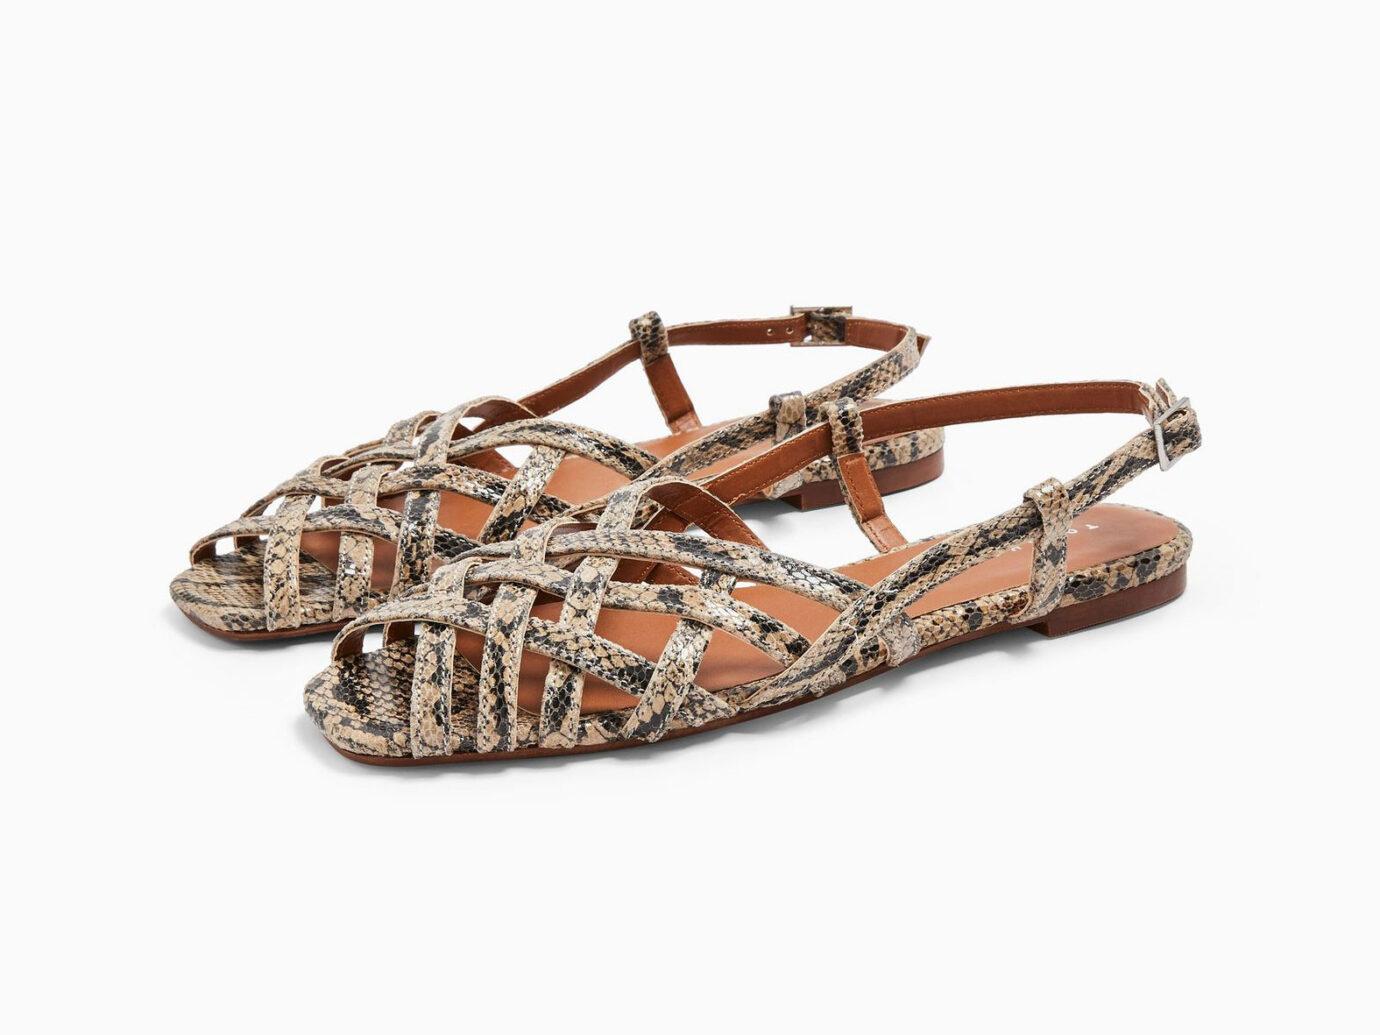 Topshop OLIVIA Strappy Slingback Sandals